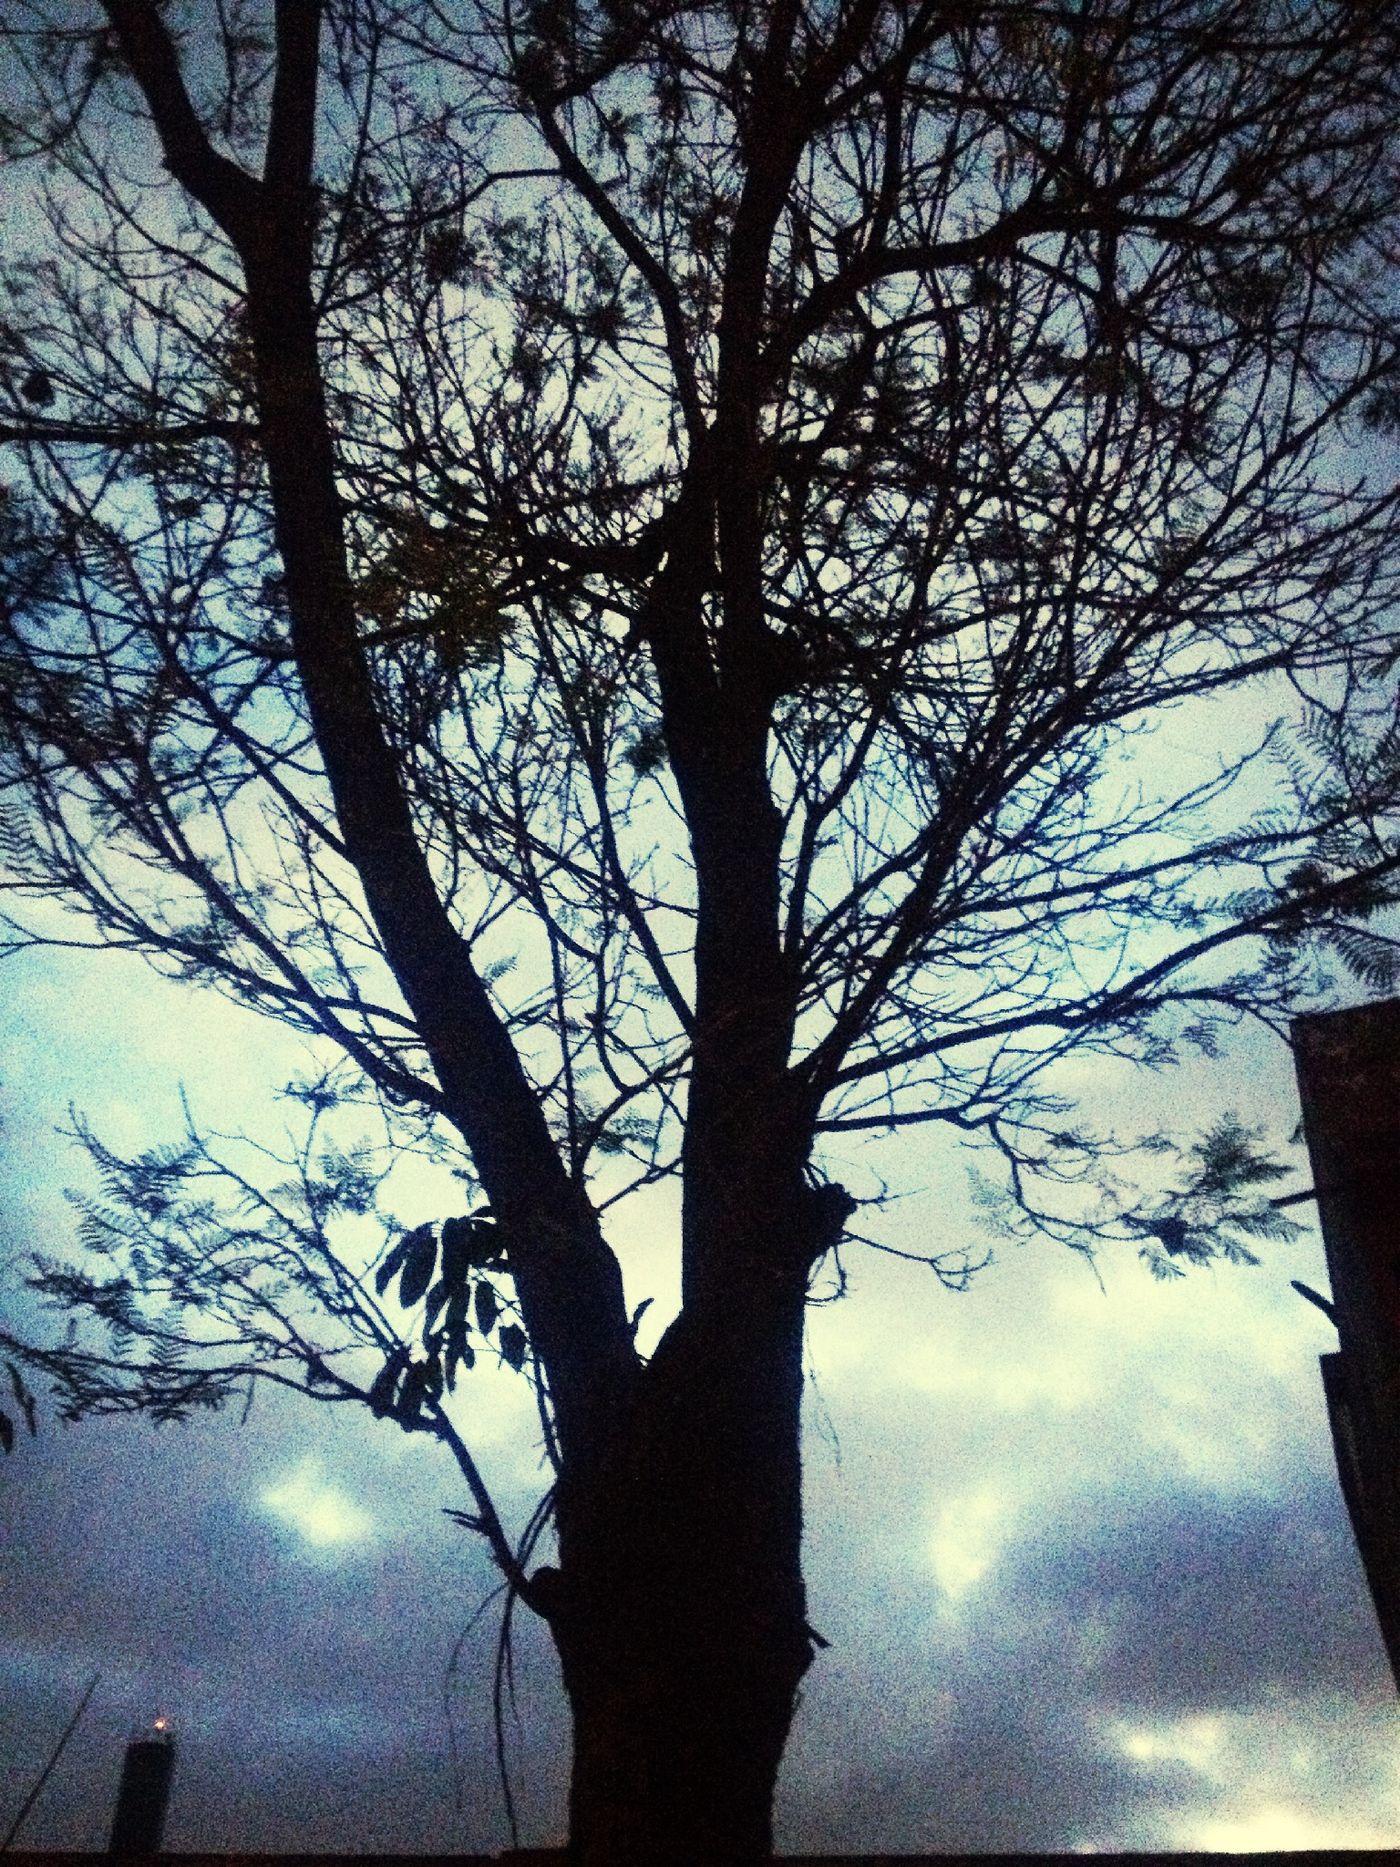 Nature Back To Work  I Like Taken Pics Trees